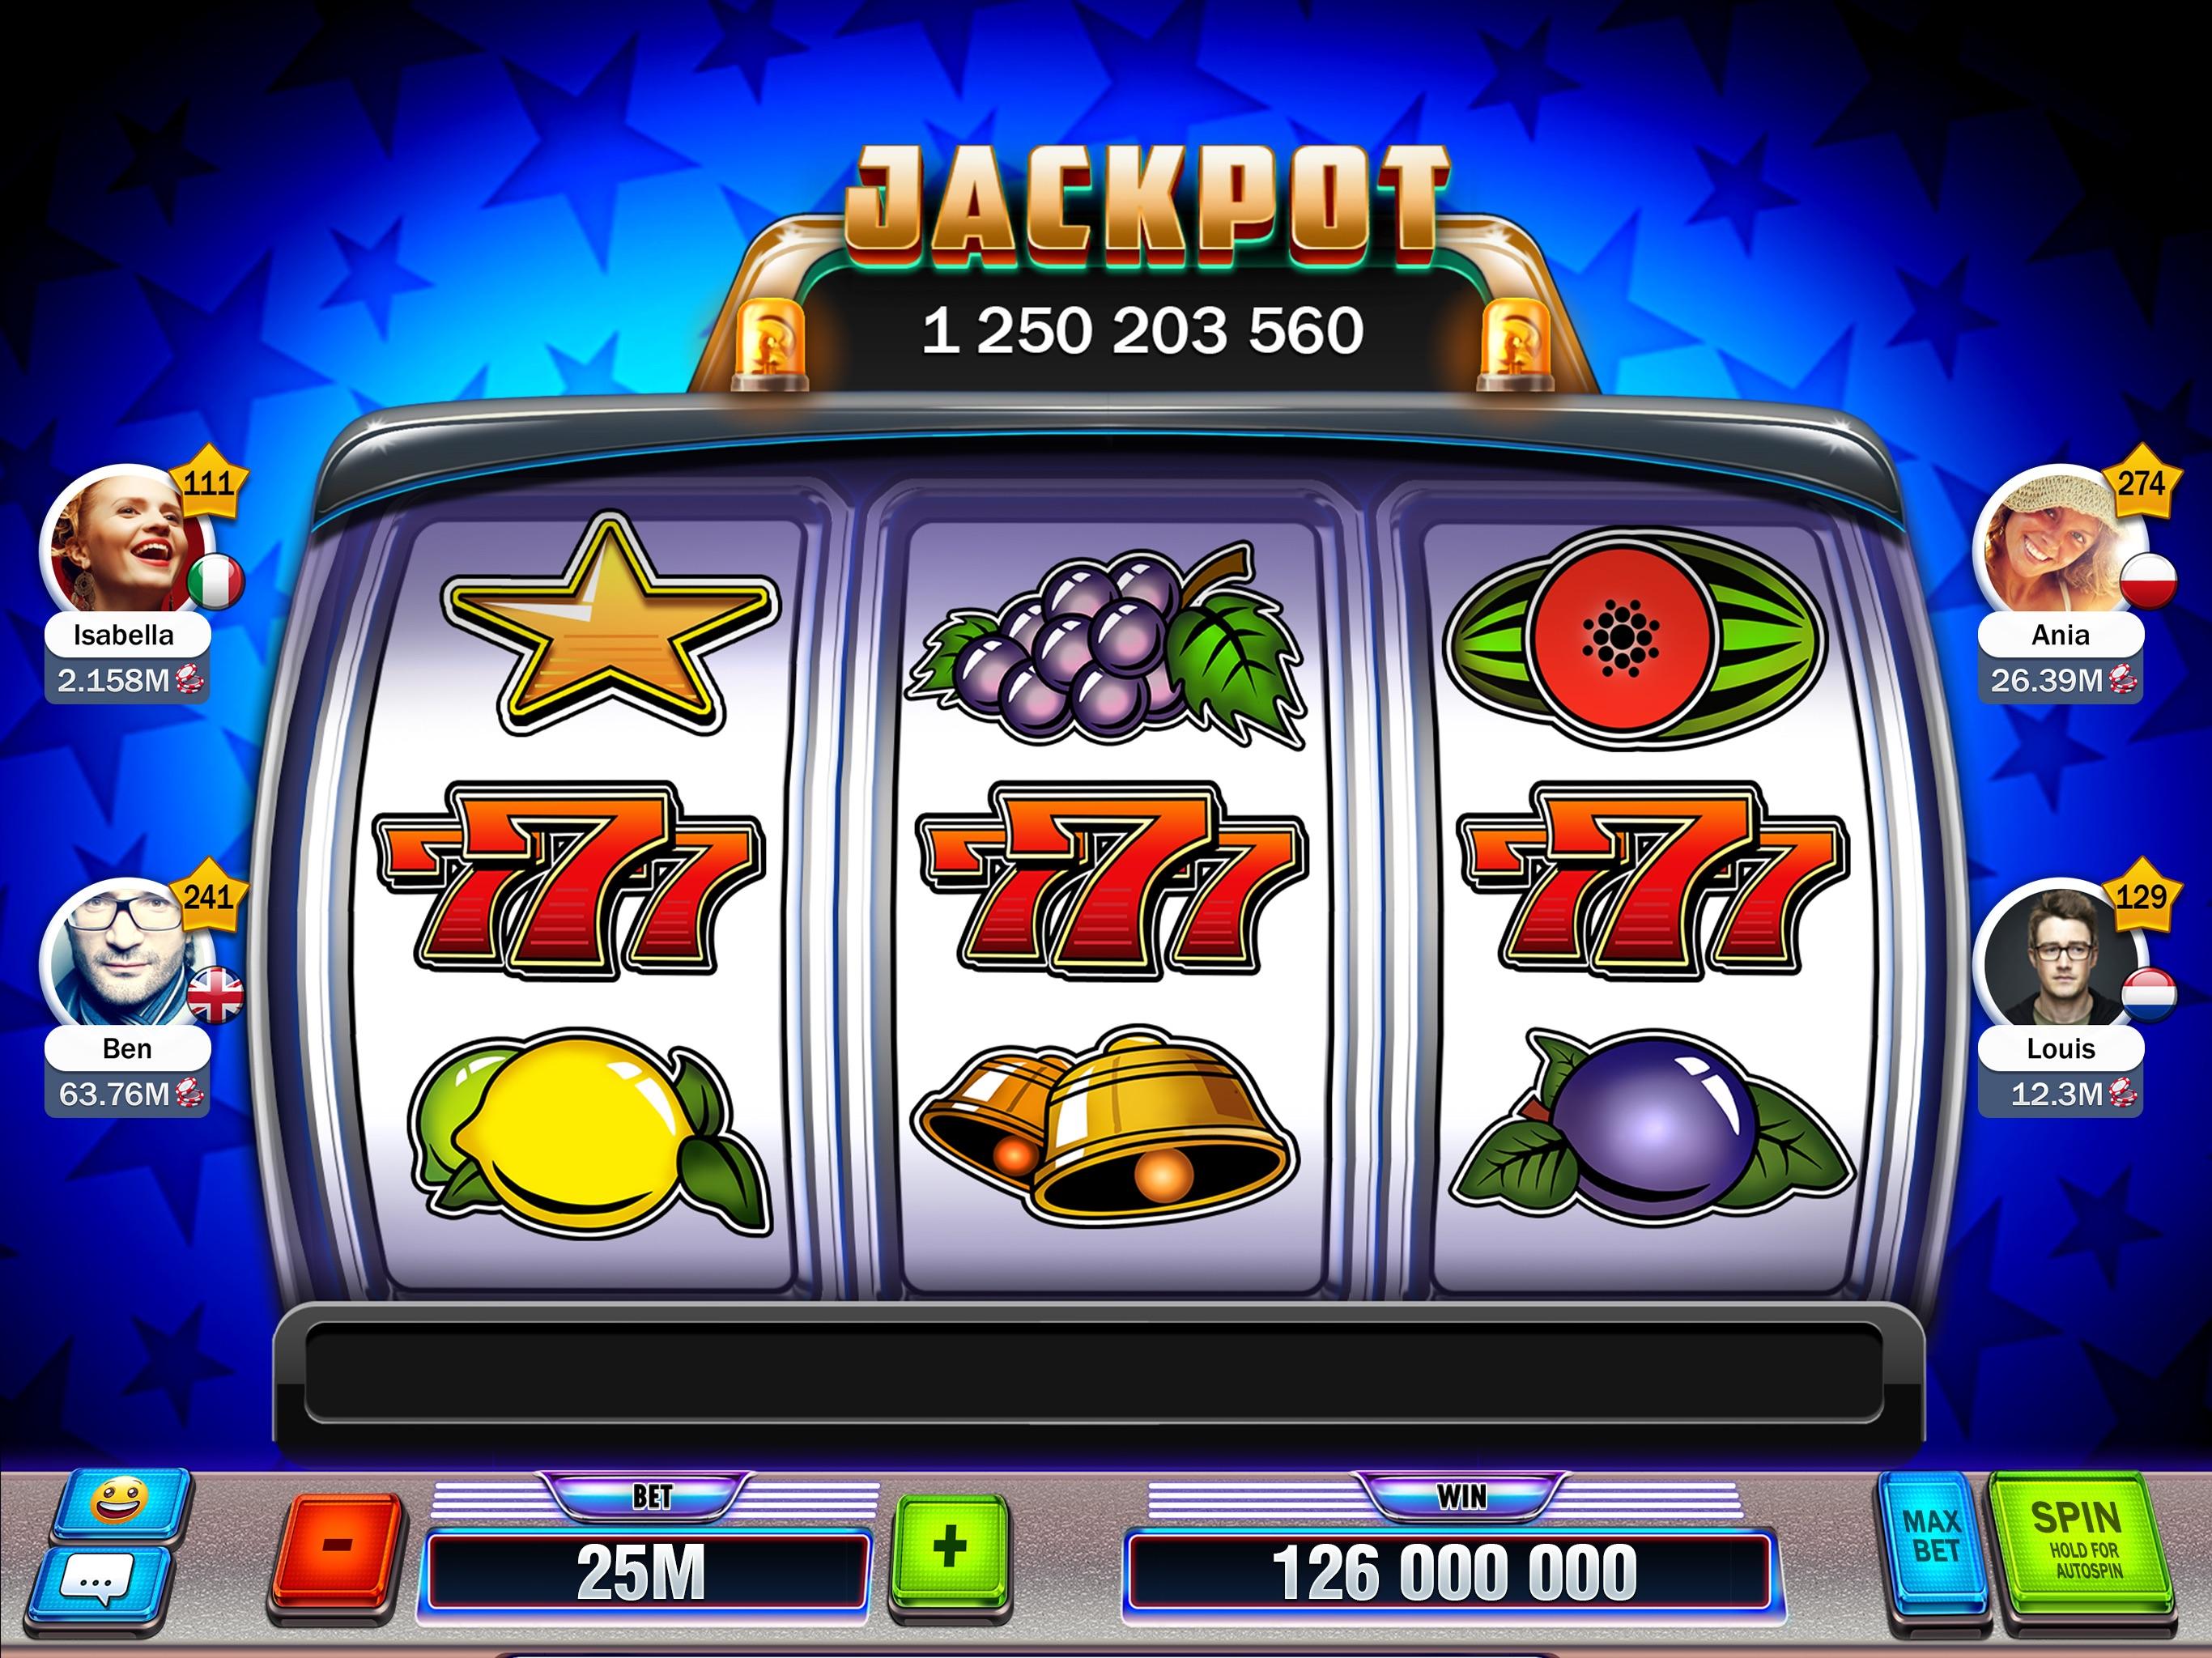 Playamo casino complaints